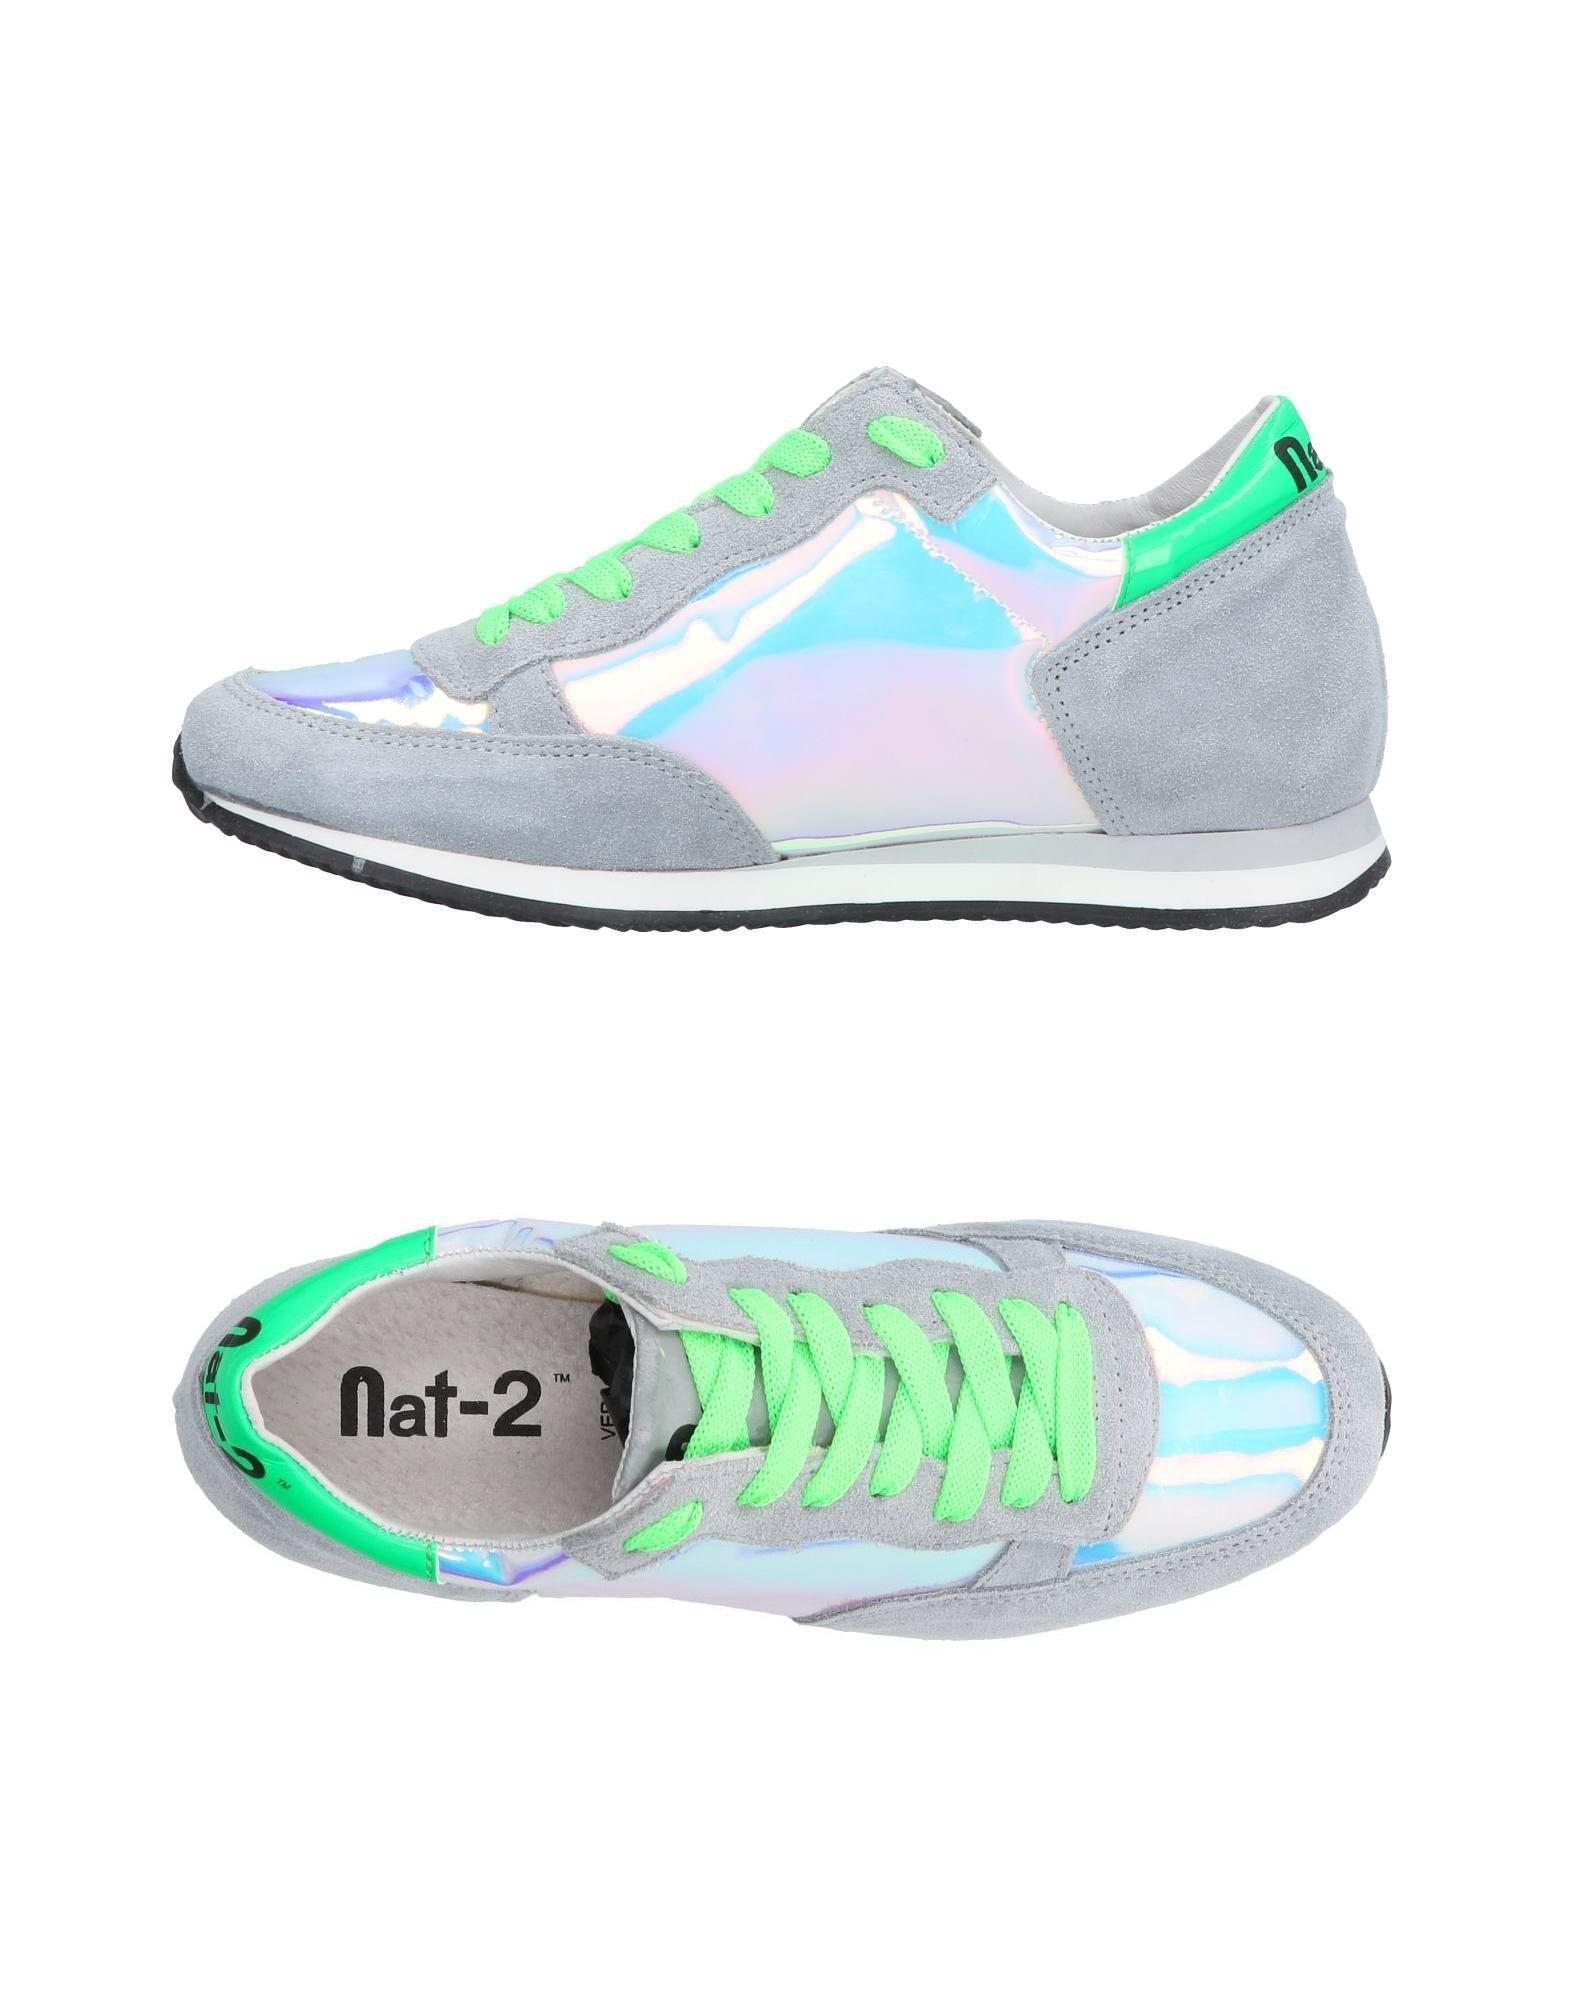 Nat 11454250DF Gute Qualität beliebte Schuhe